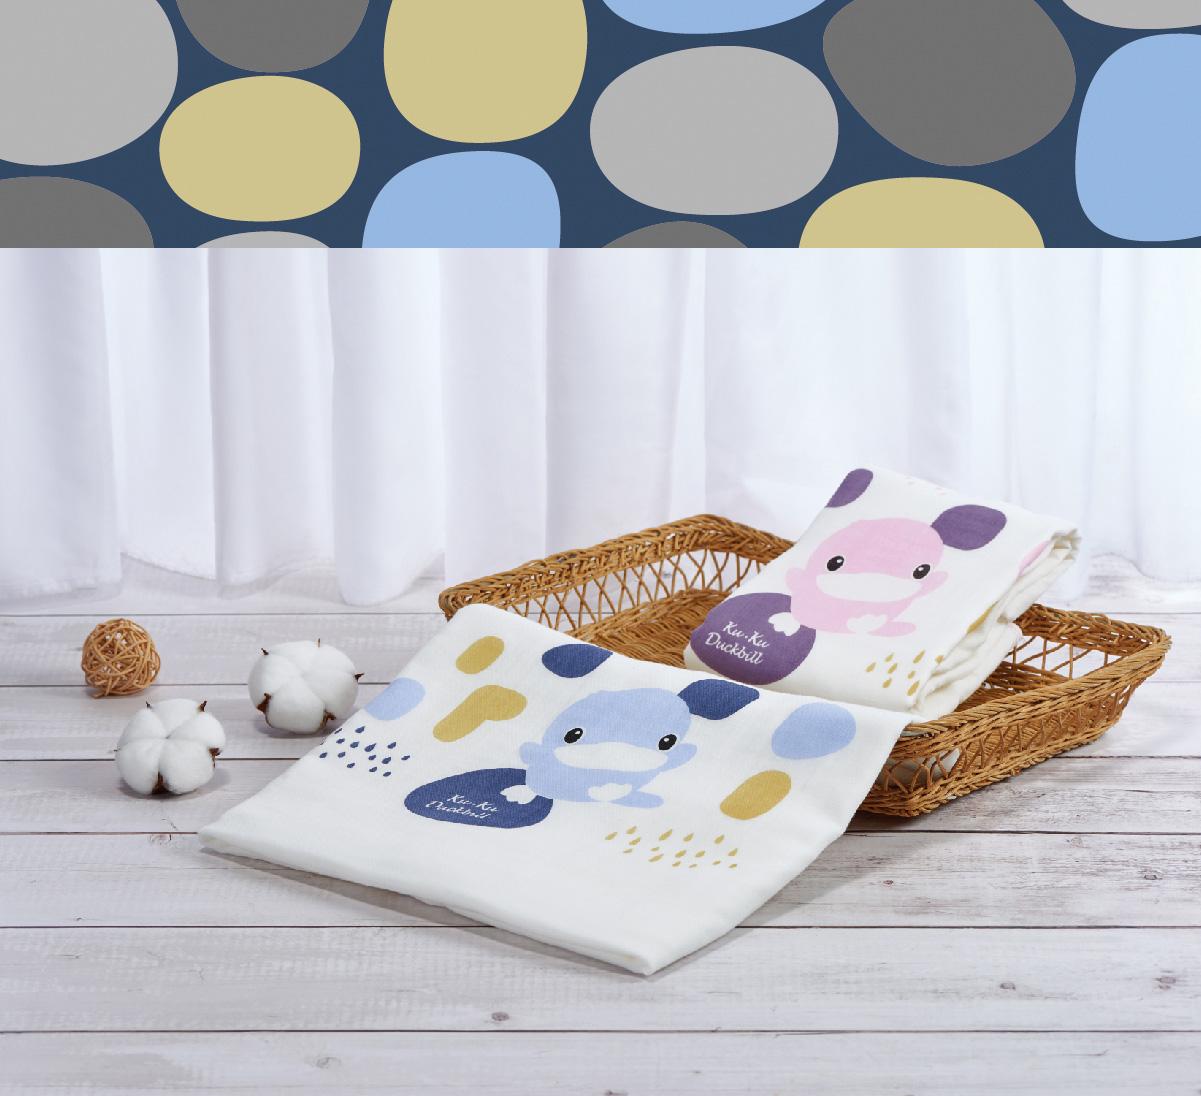 proimages/Cottons&BabyClothing/BabyClothesSeries/GauzeBathTowel/2394/2394-成長印記紗布大浴巾EDM12.jpg